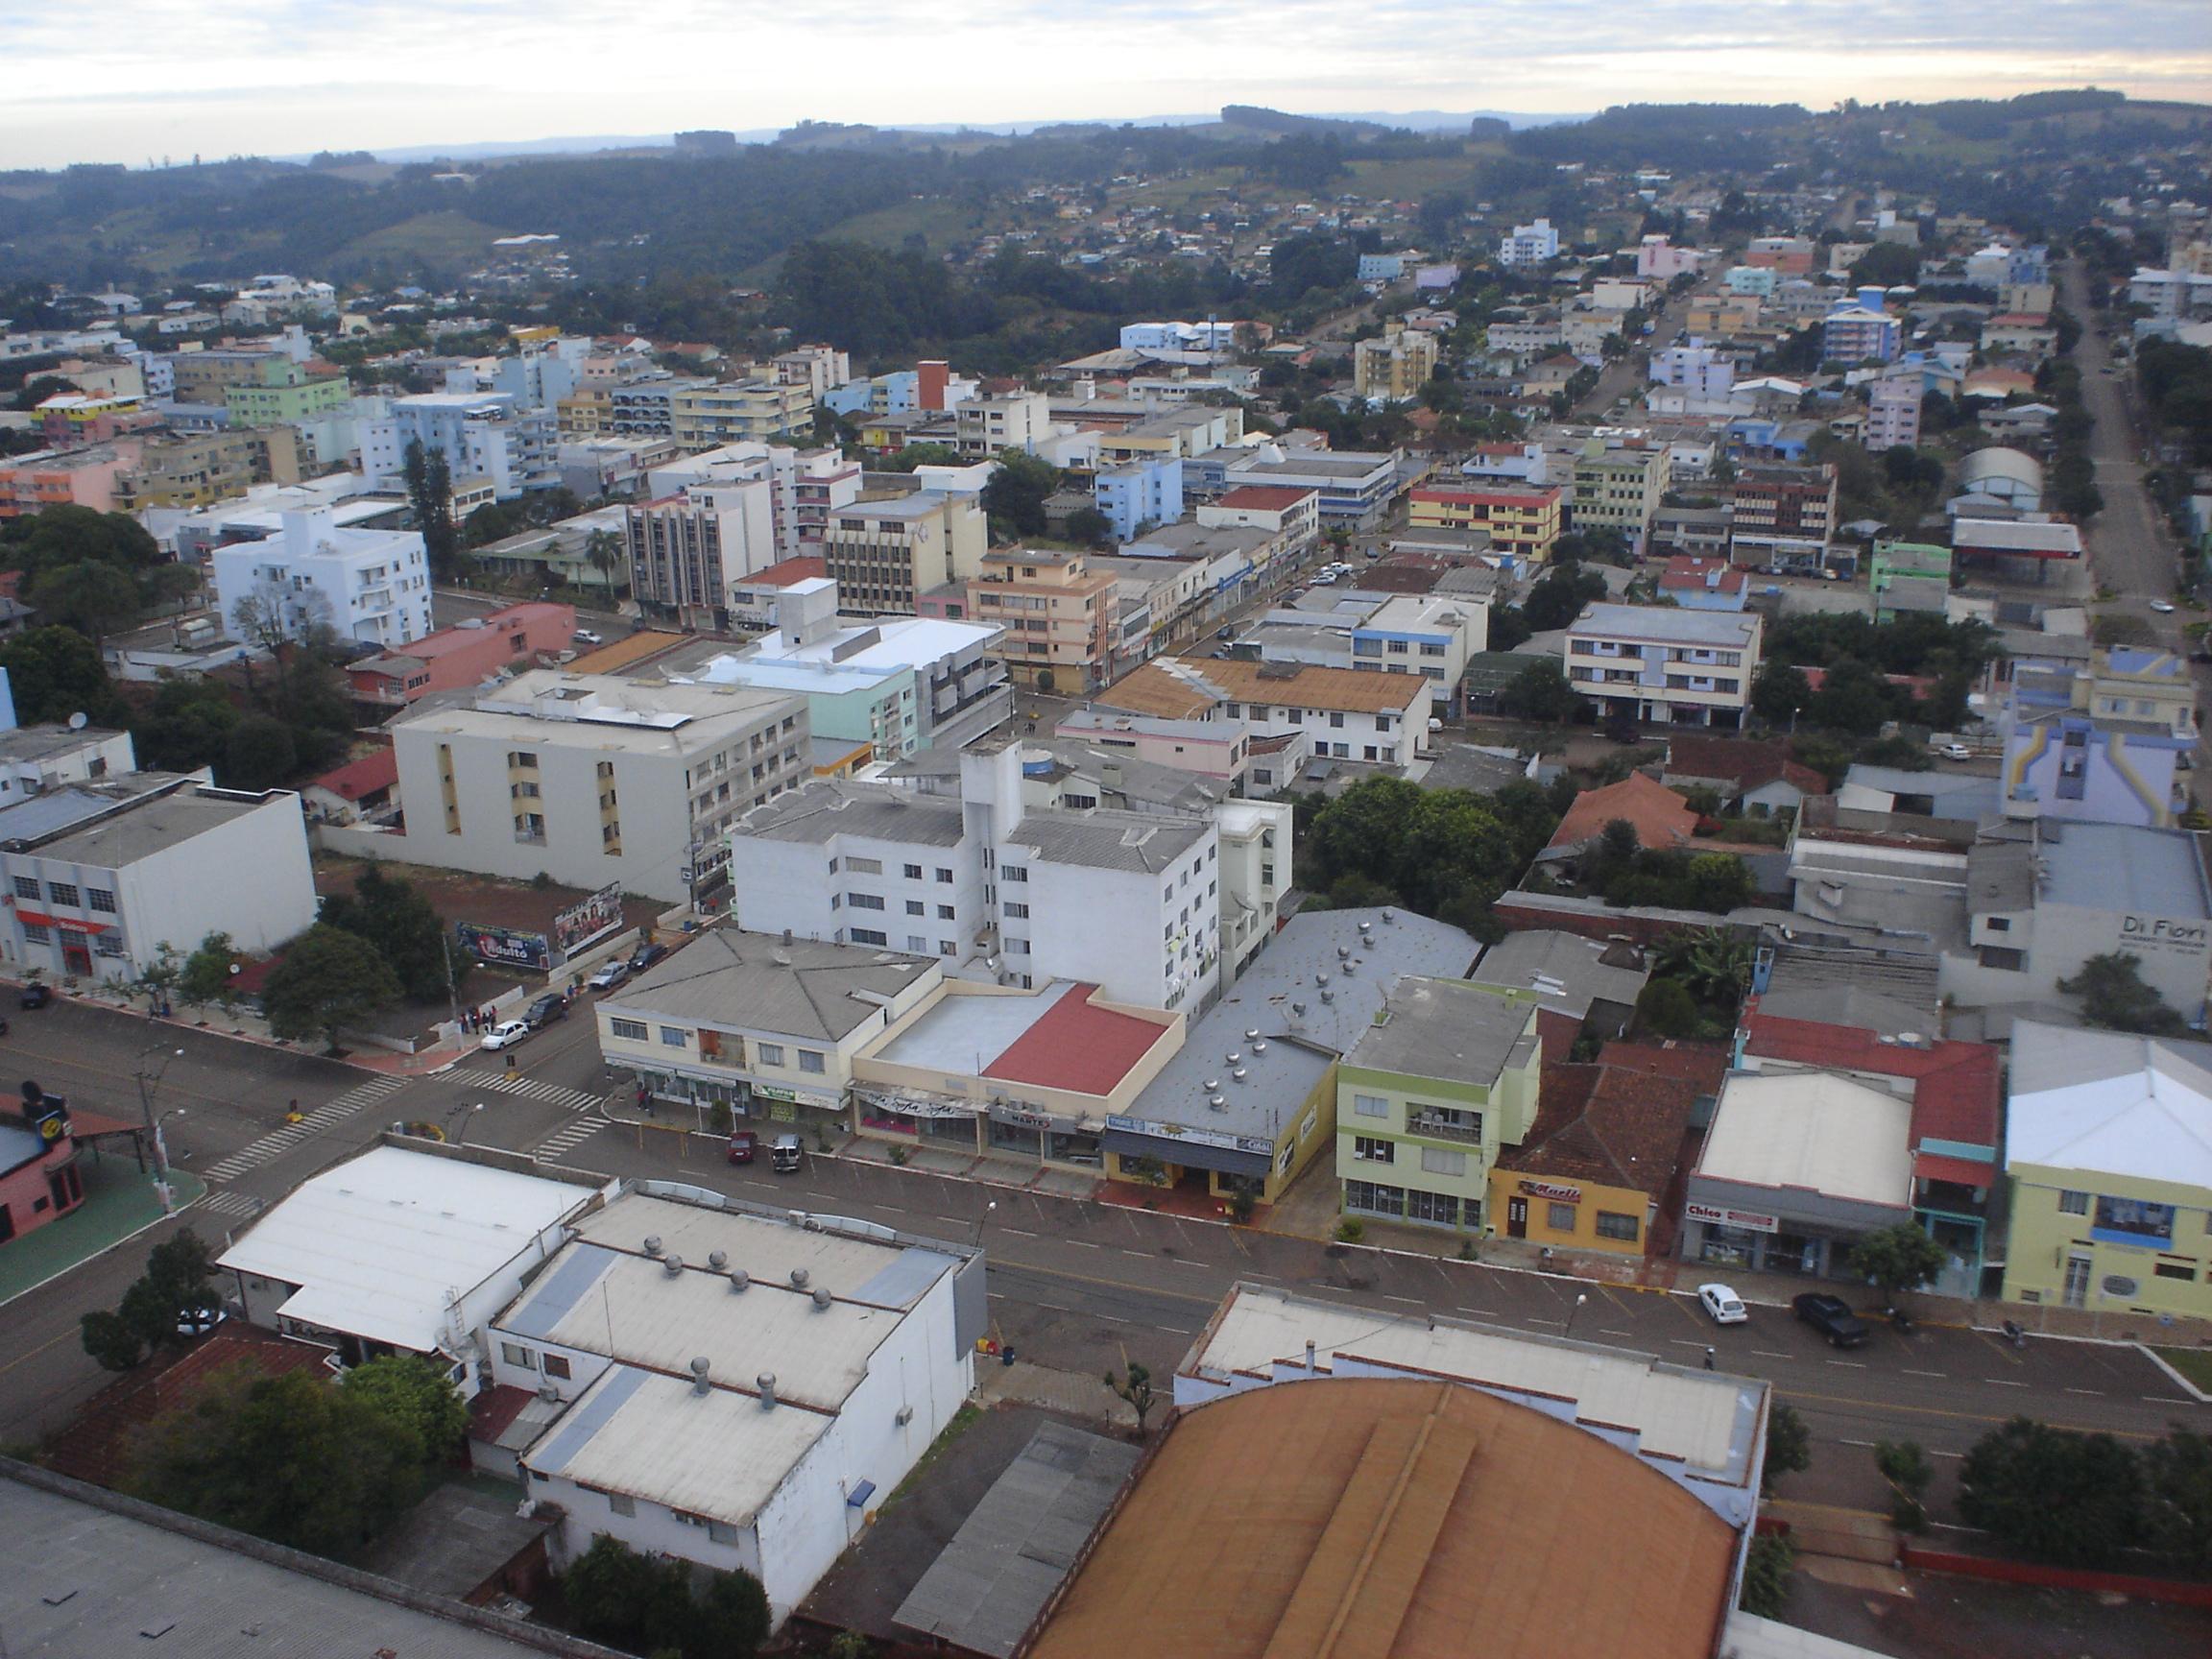 São Miguel do Oeste Santa Catarina fonte: upload.wikimedia.org